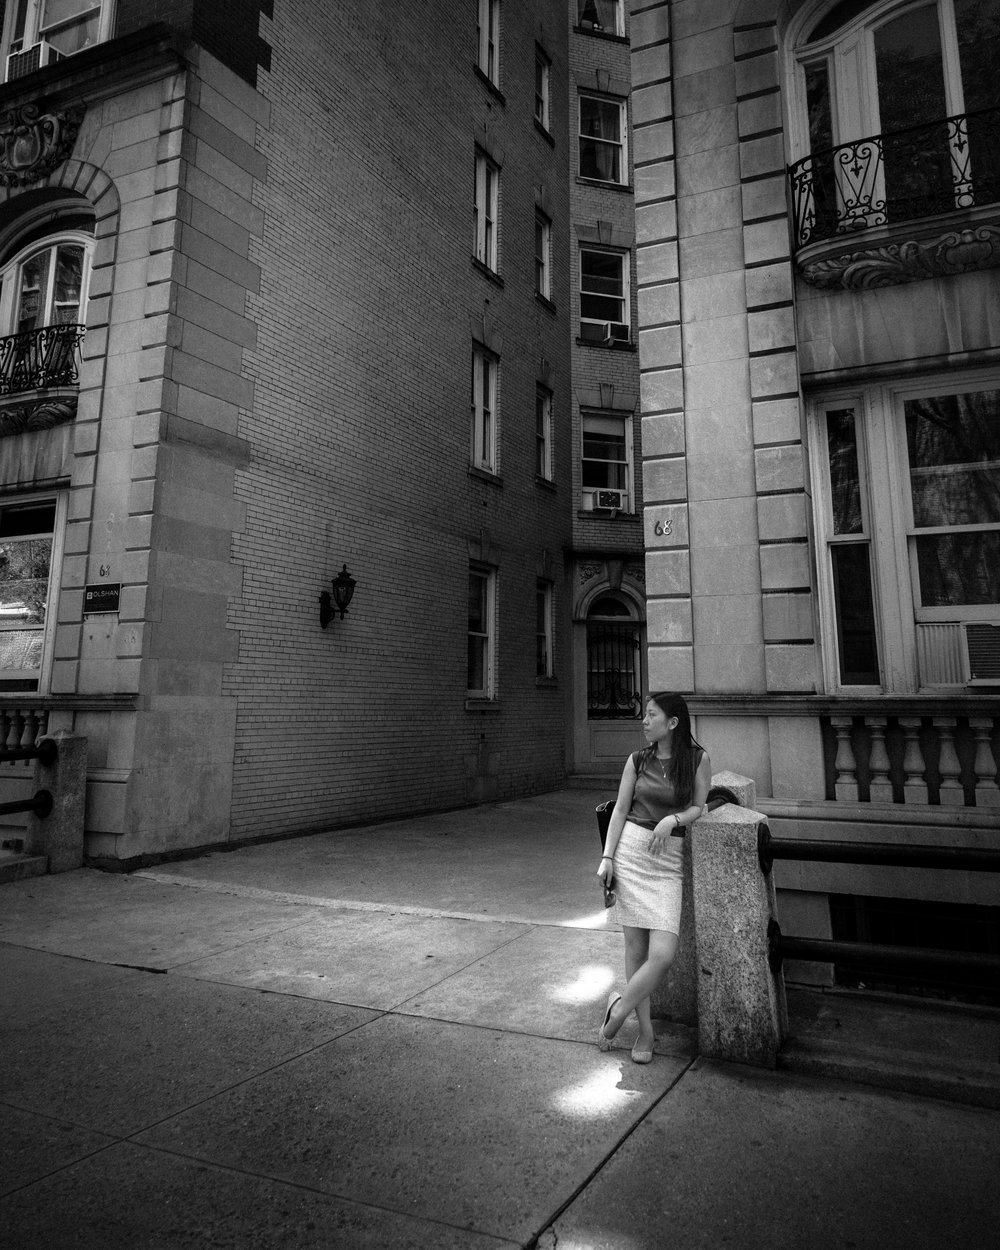 Bonny_BW_BrooklynHeights.jpg